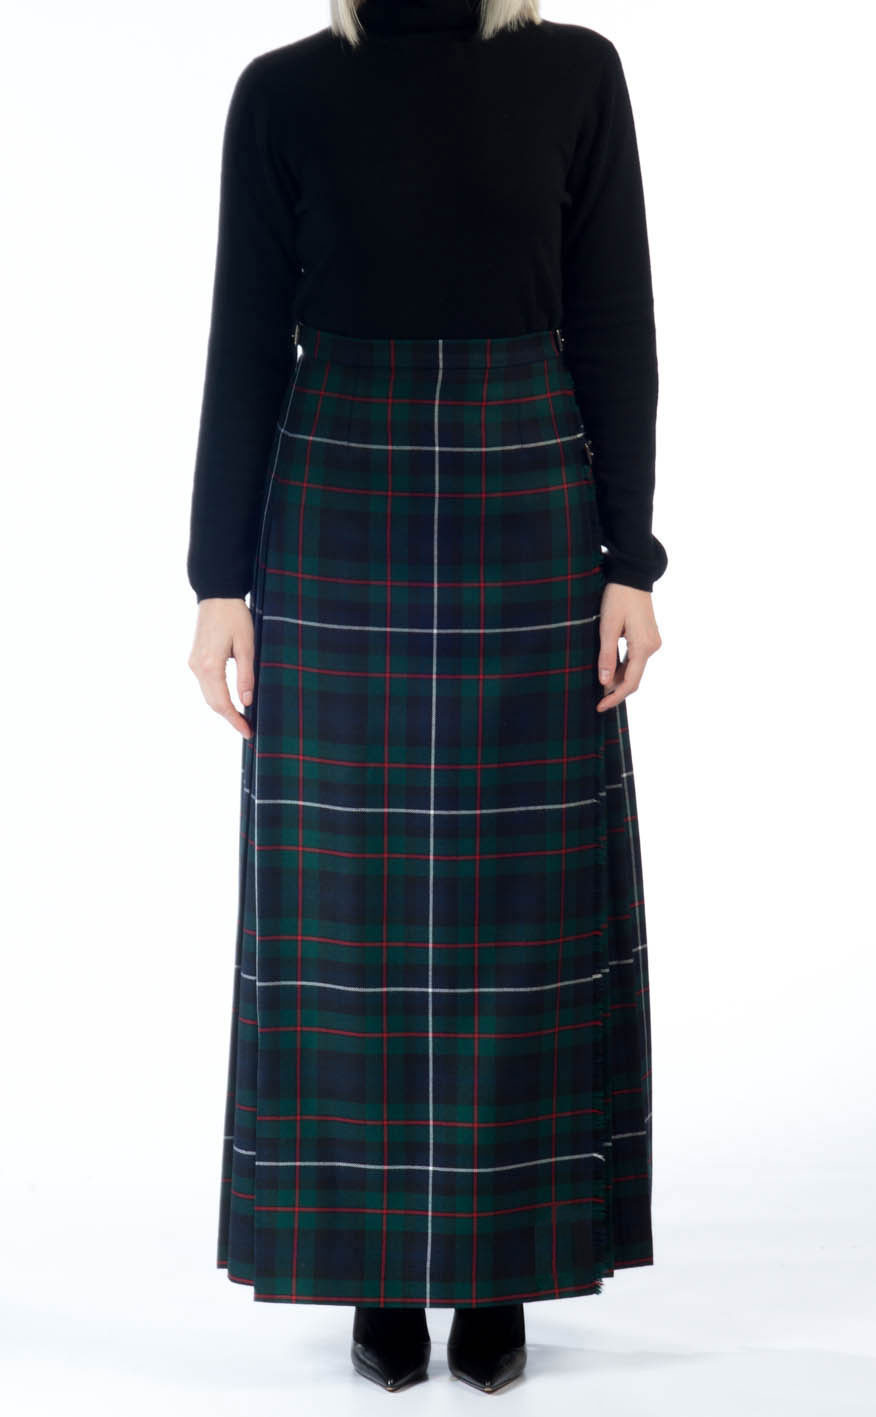 Hostess Skirt Tartan Clan By Scotweb